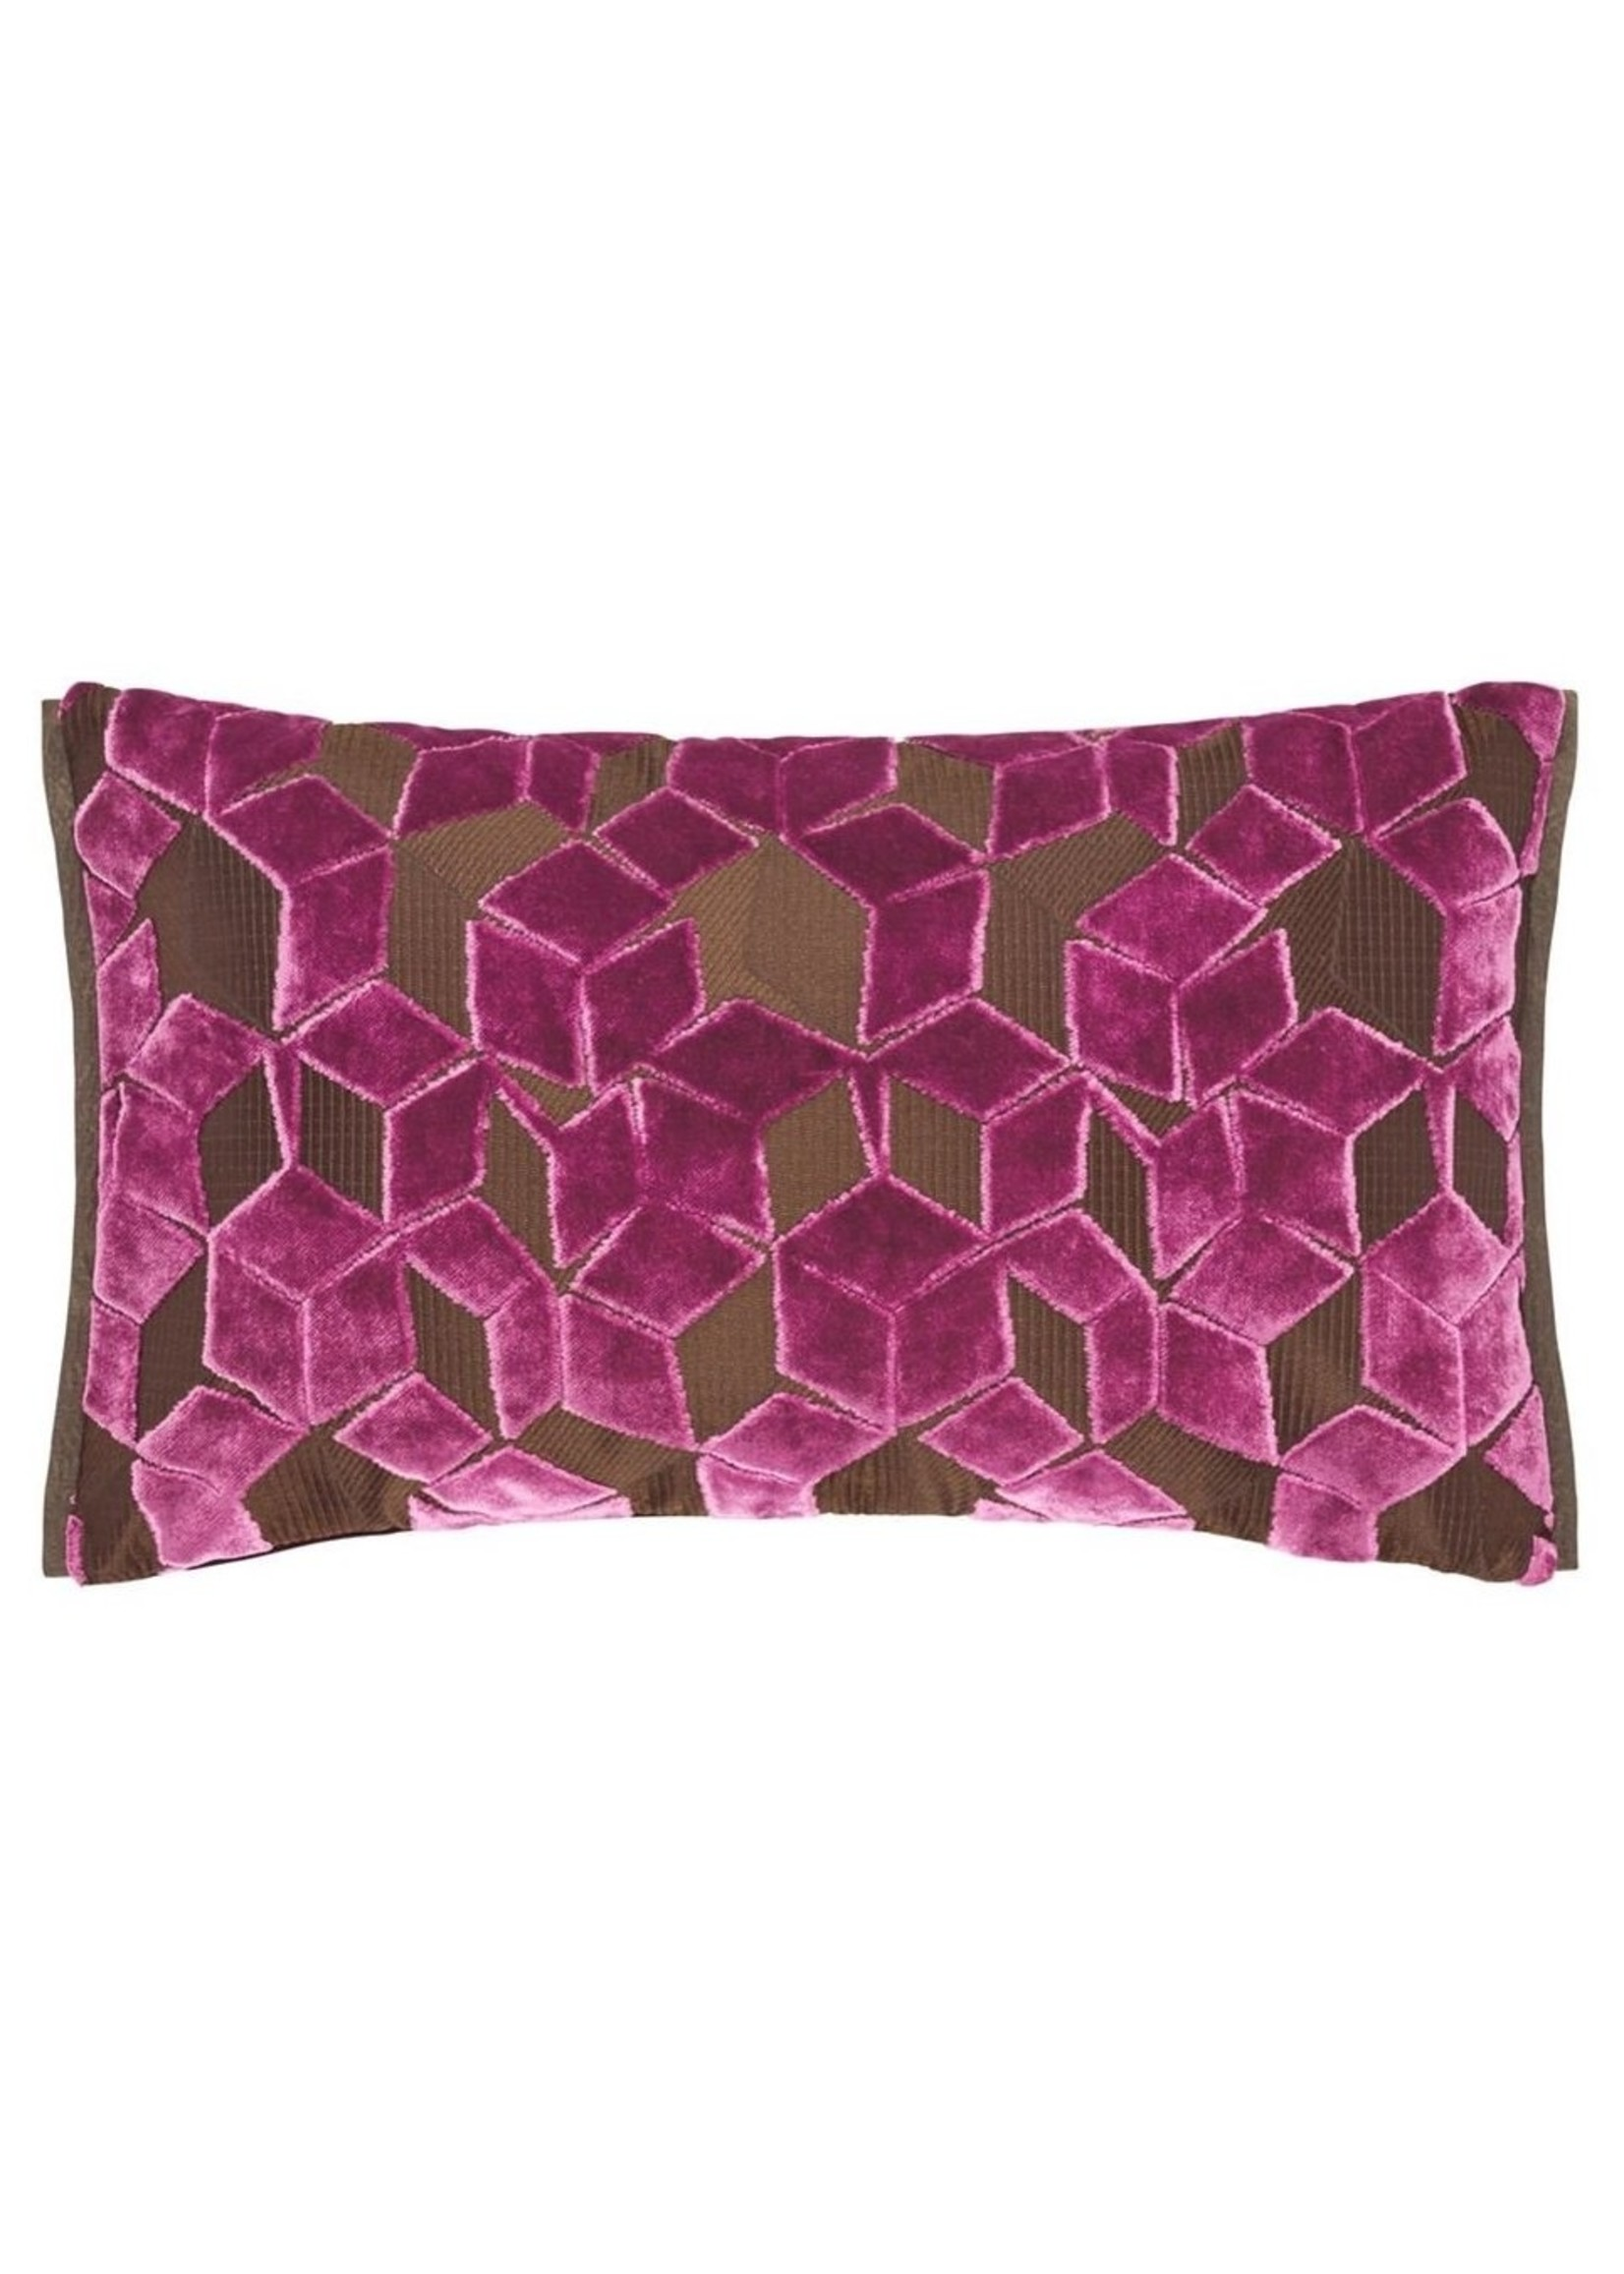 Designers Guild Fitzrovia Damson Pink Pillow